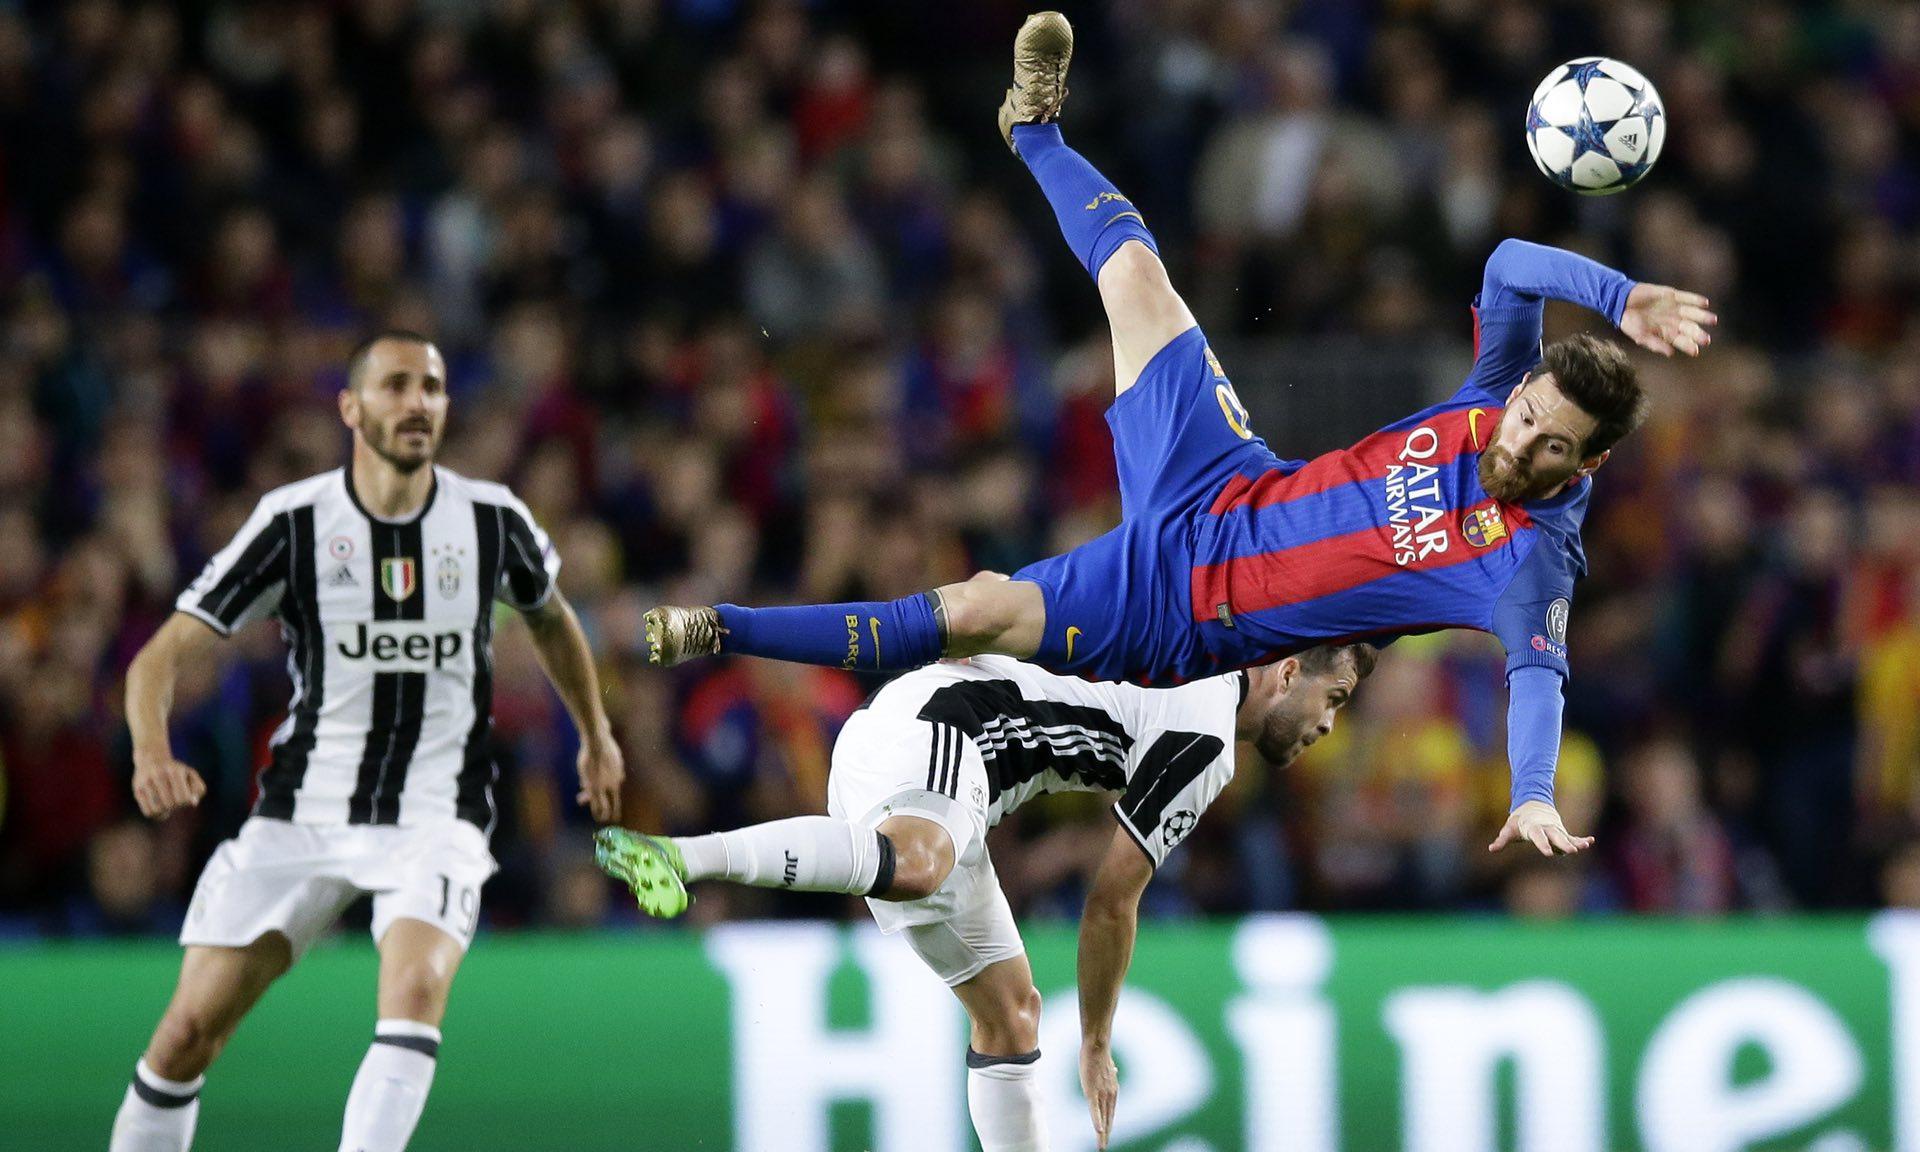 Барселона не успеа до ново чудо  Монако повторно подобар од Дортмунд